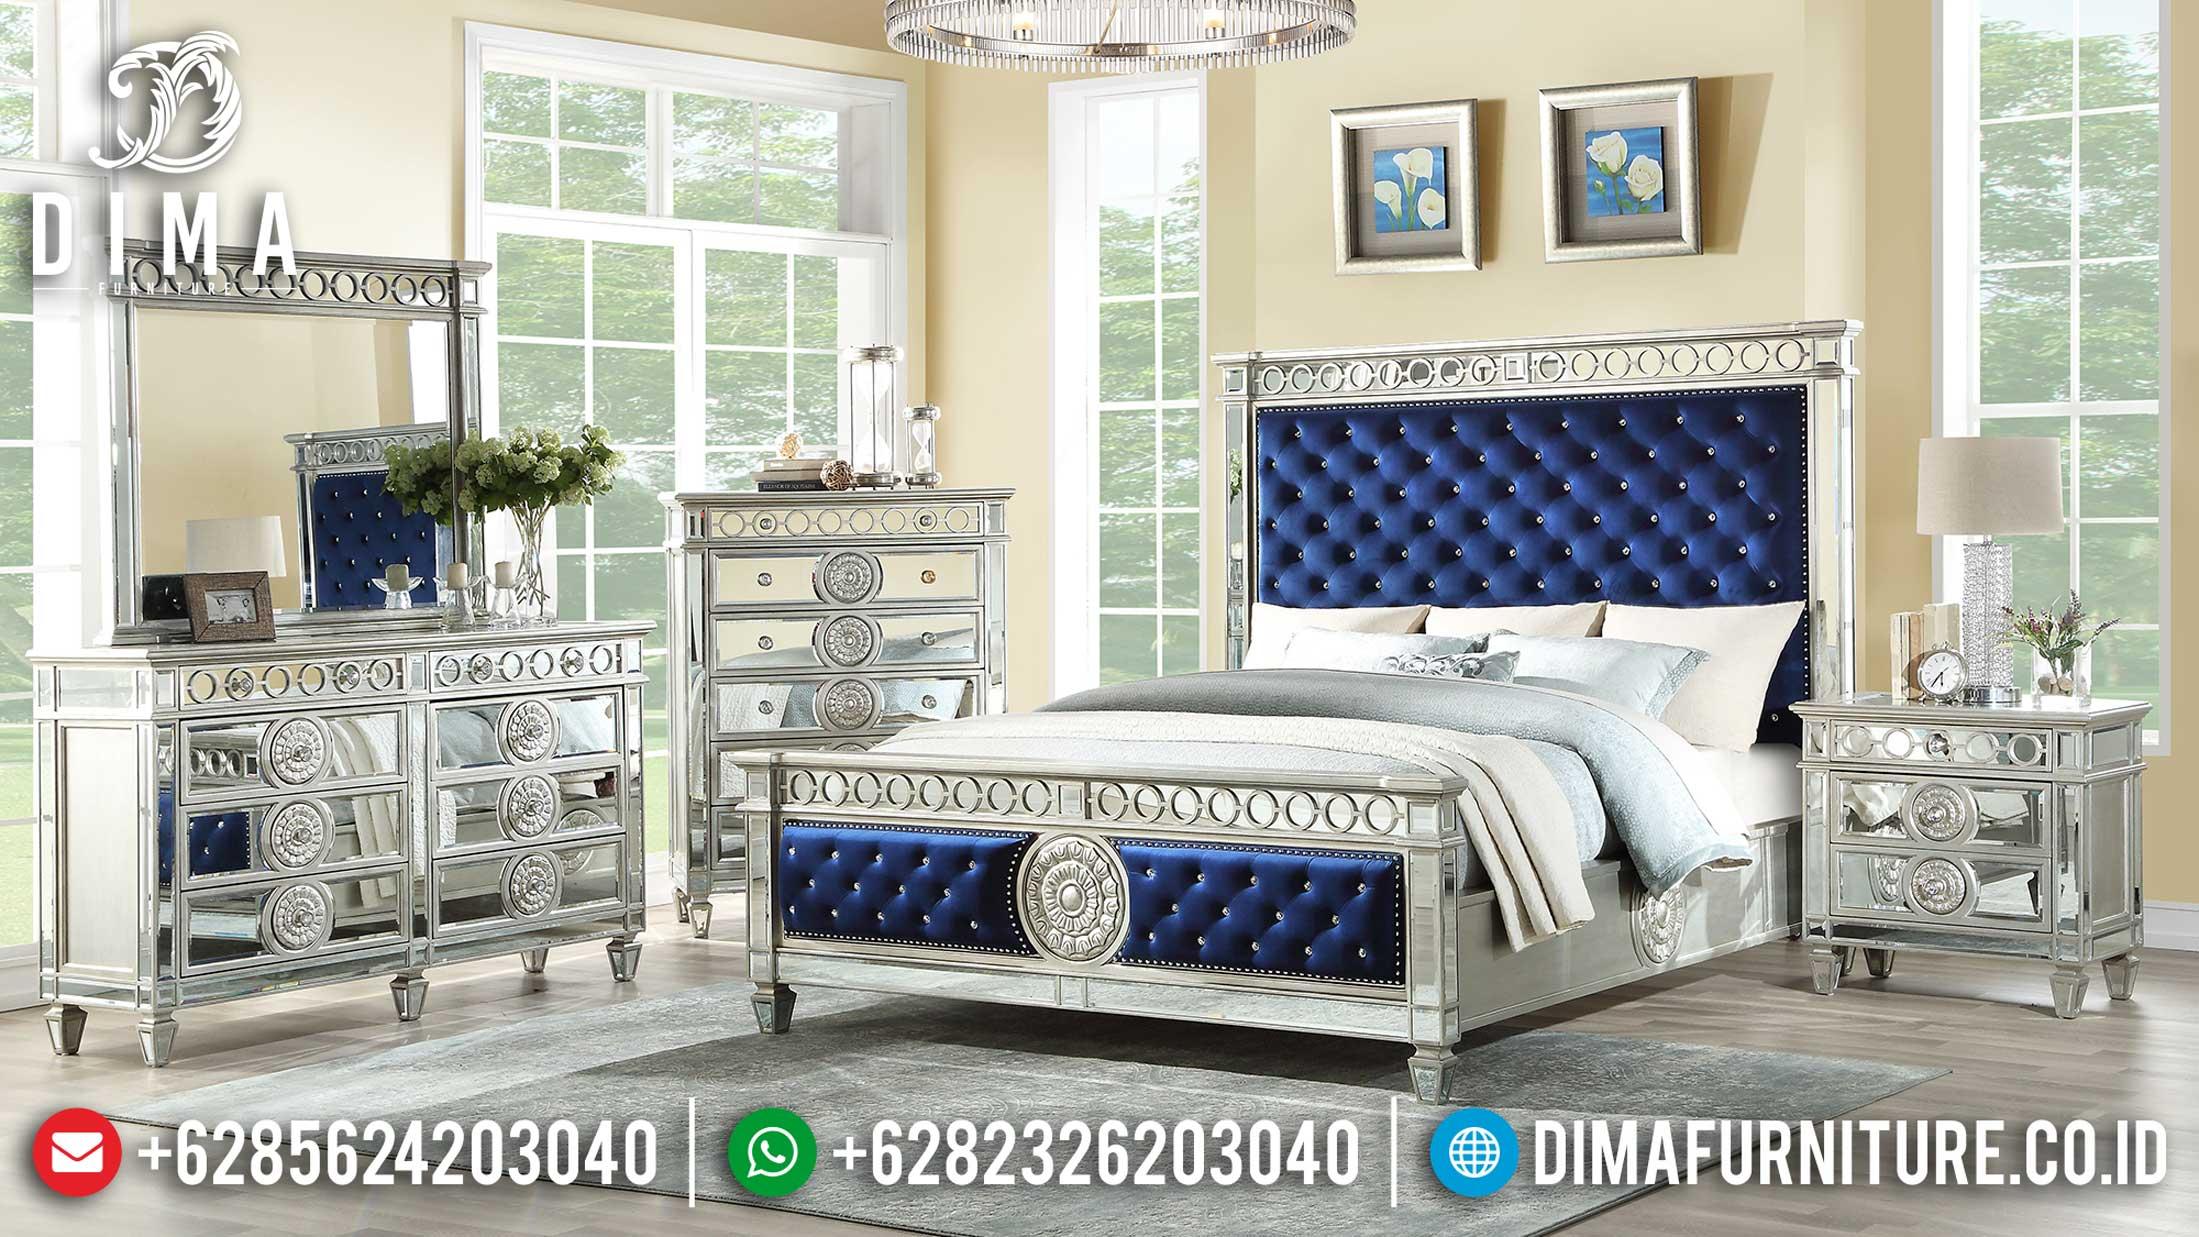 Elizabeth Tempat Tidur Minimalis Modern Royal Style Luxury Glassed Design TTJ-1128